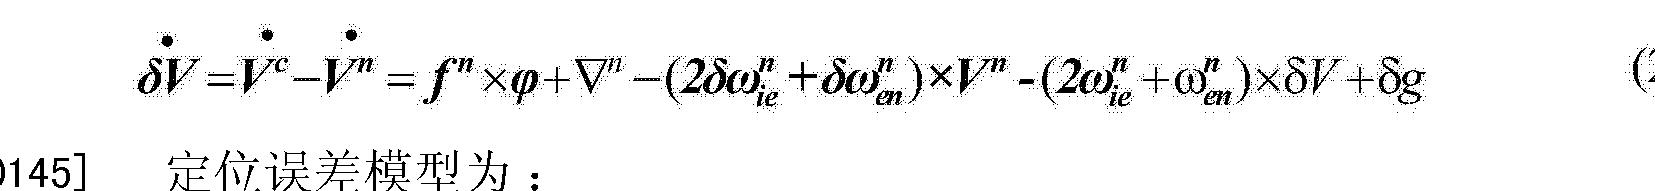 Figure CN103759730AD00152